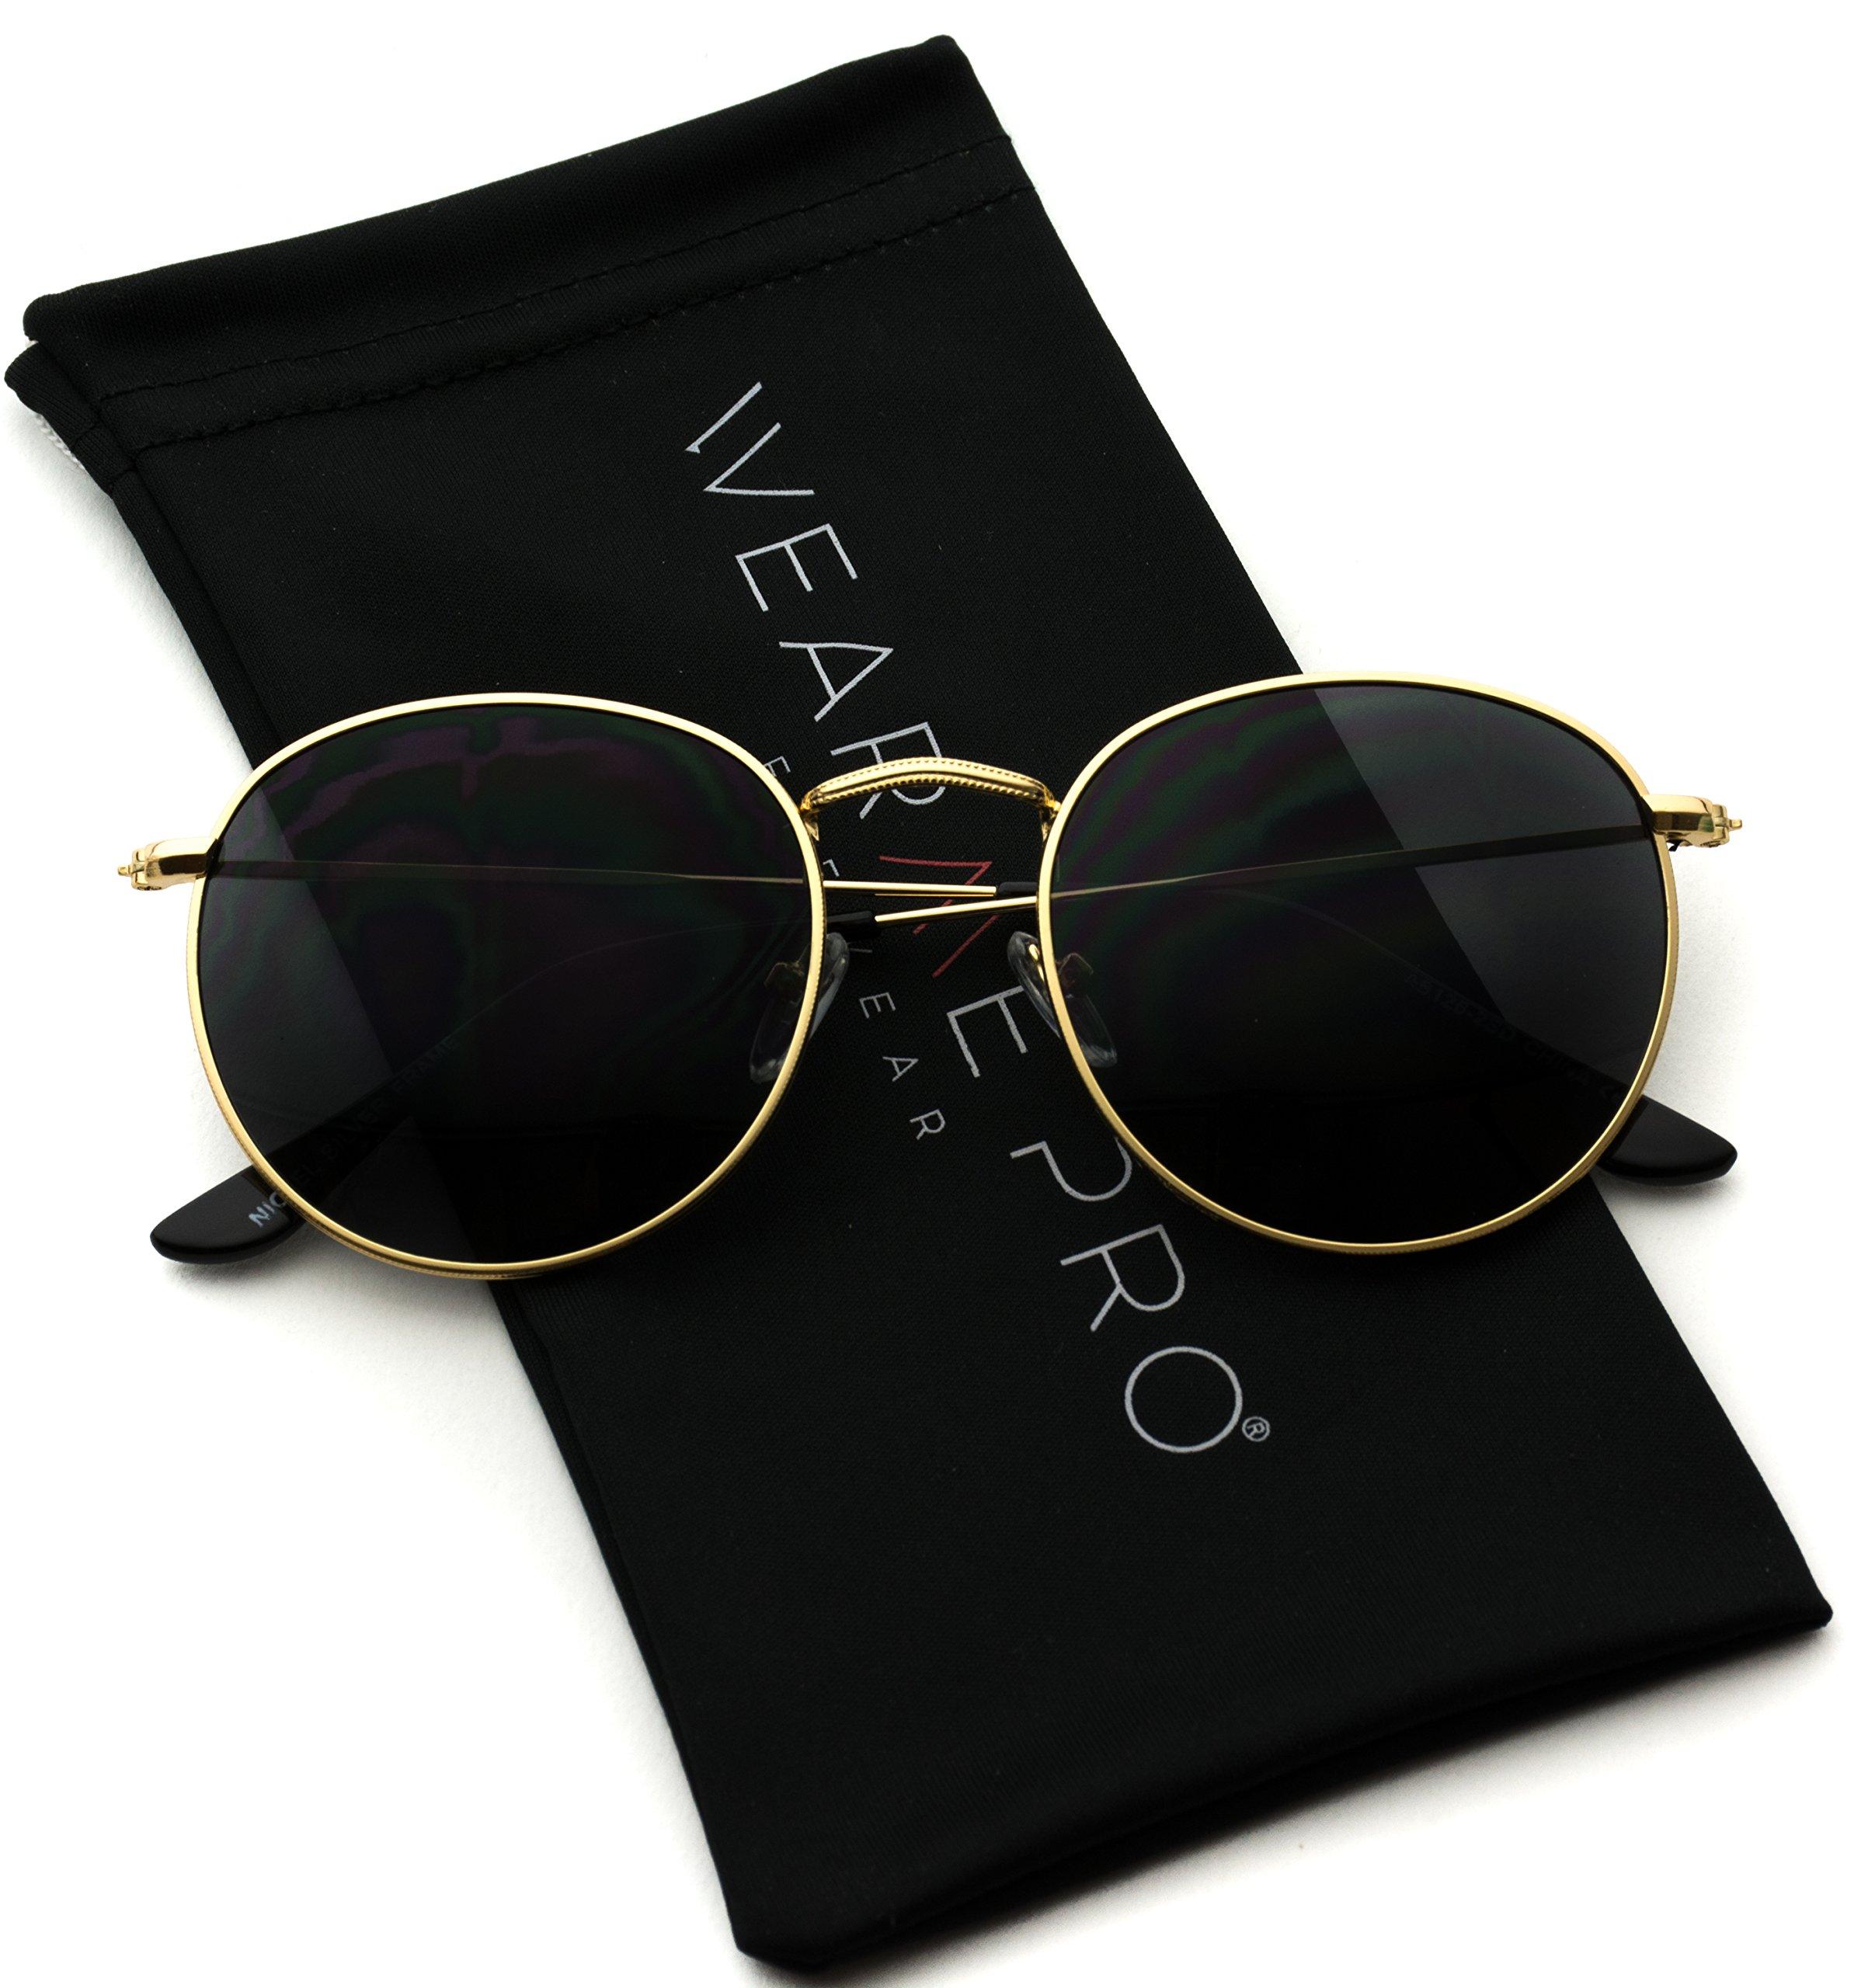 WearMe Pro - Reflective Lens Round Trendy Sunglasses (Gold Frame/Black Lens, 51) by WearMe Pro